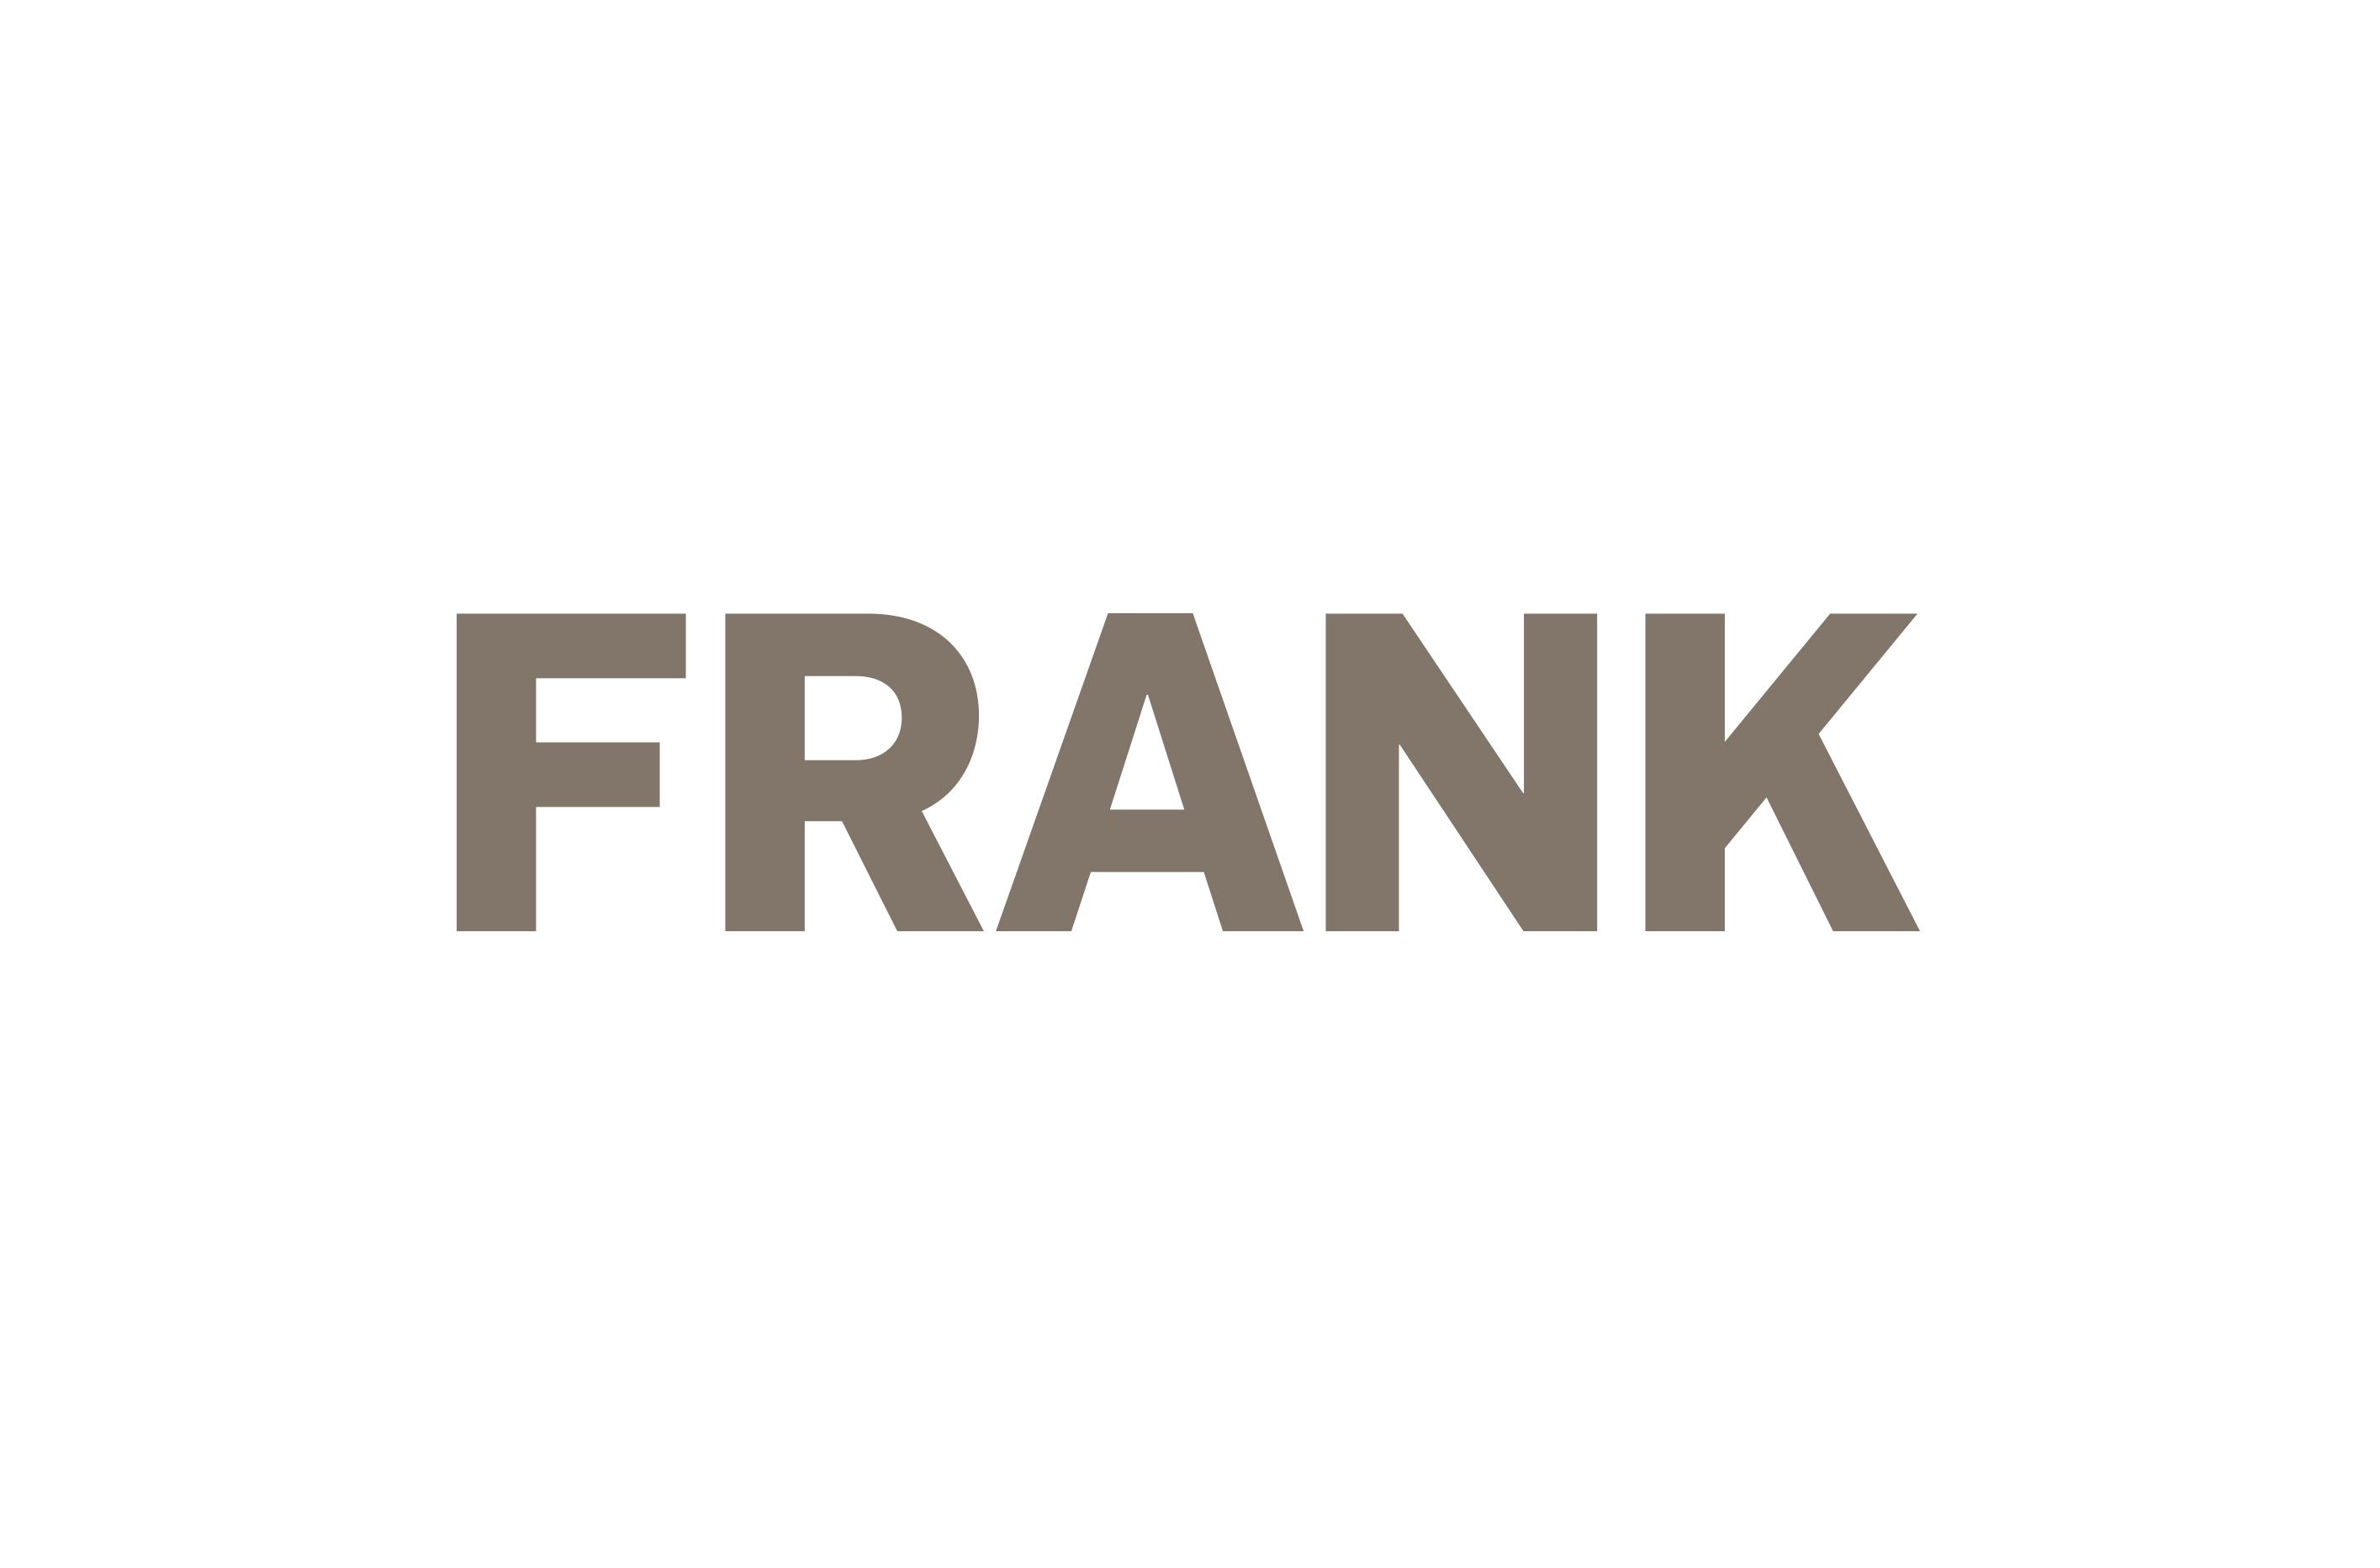 Frank Wordmark